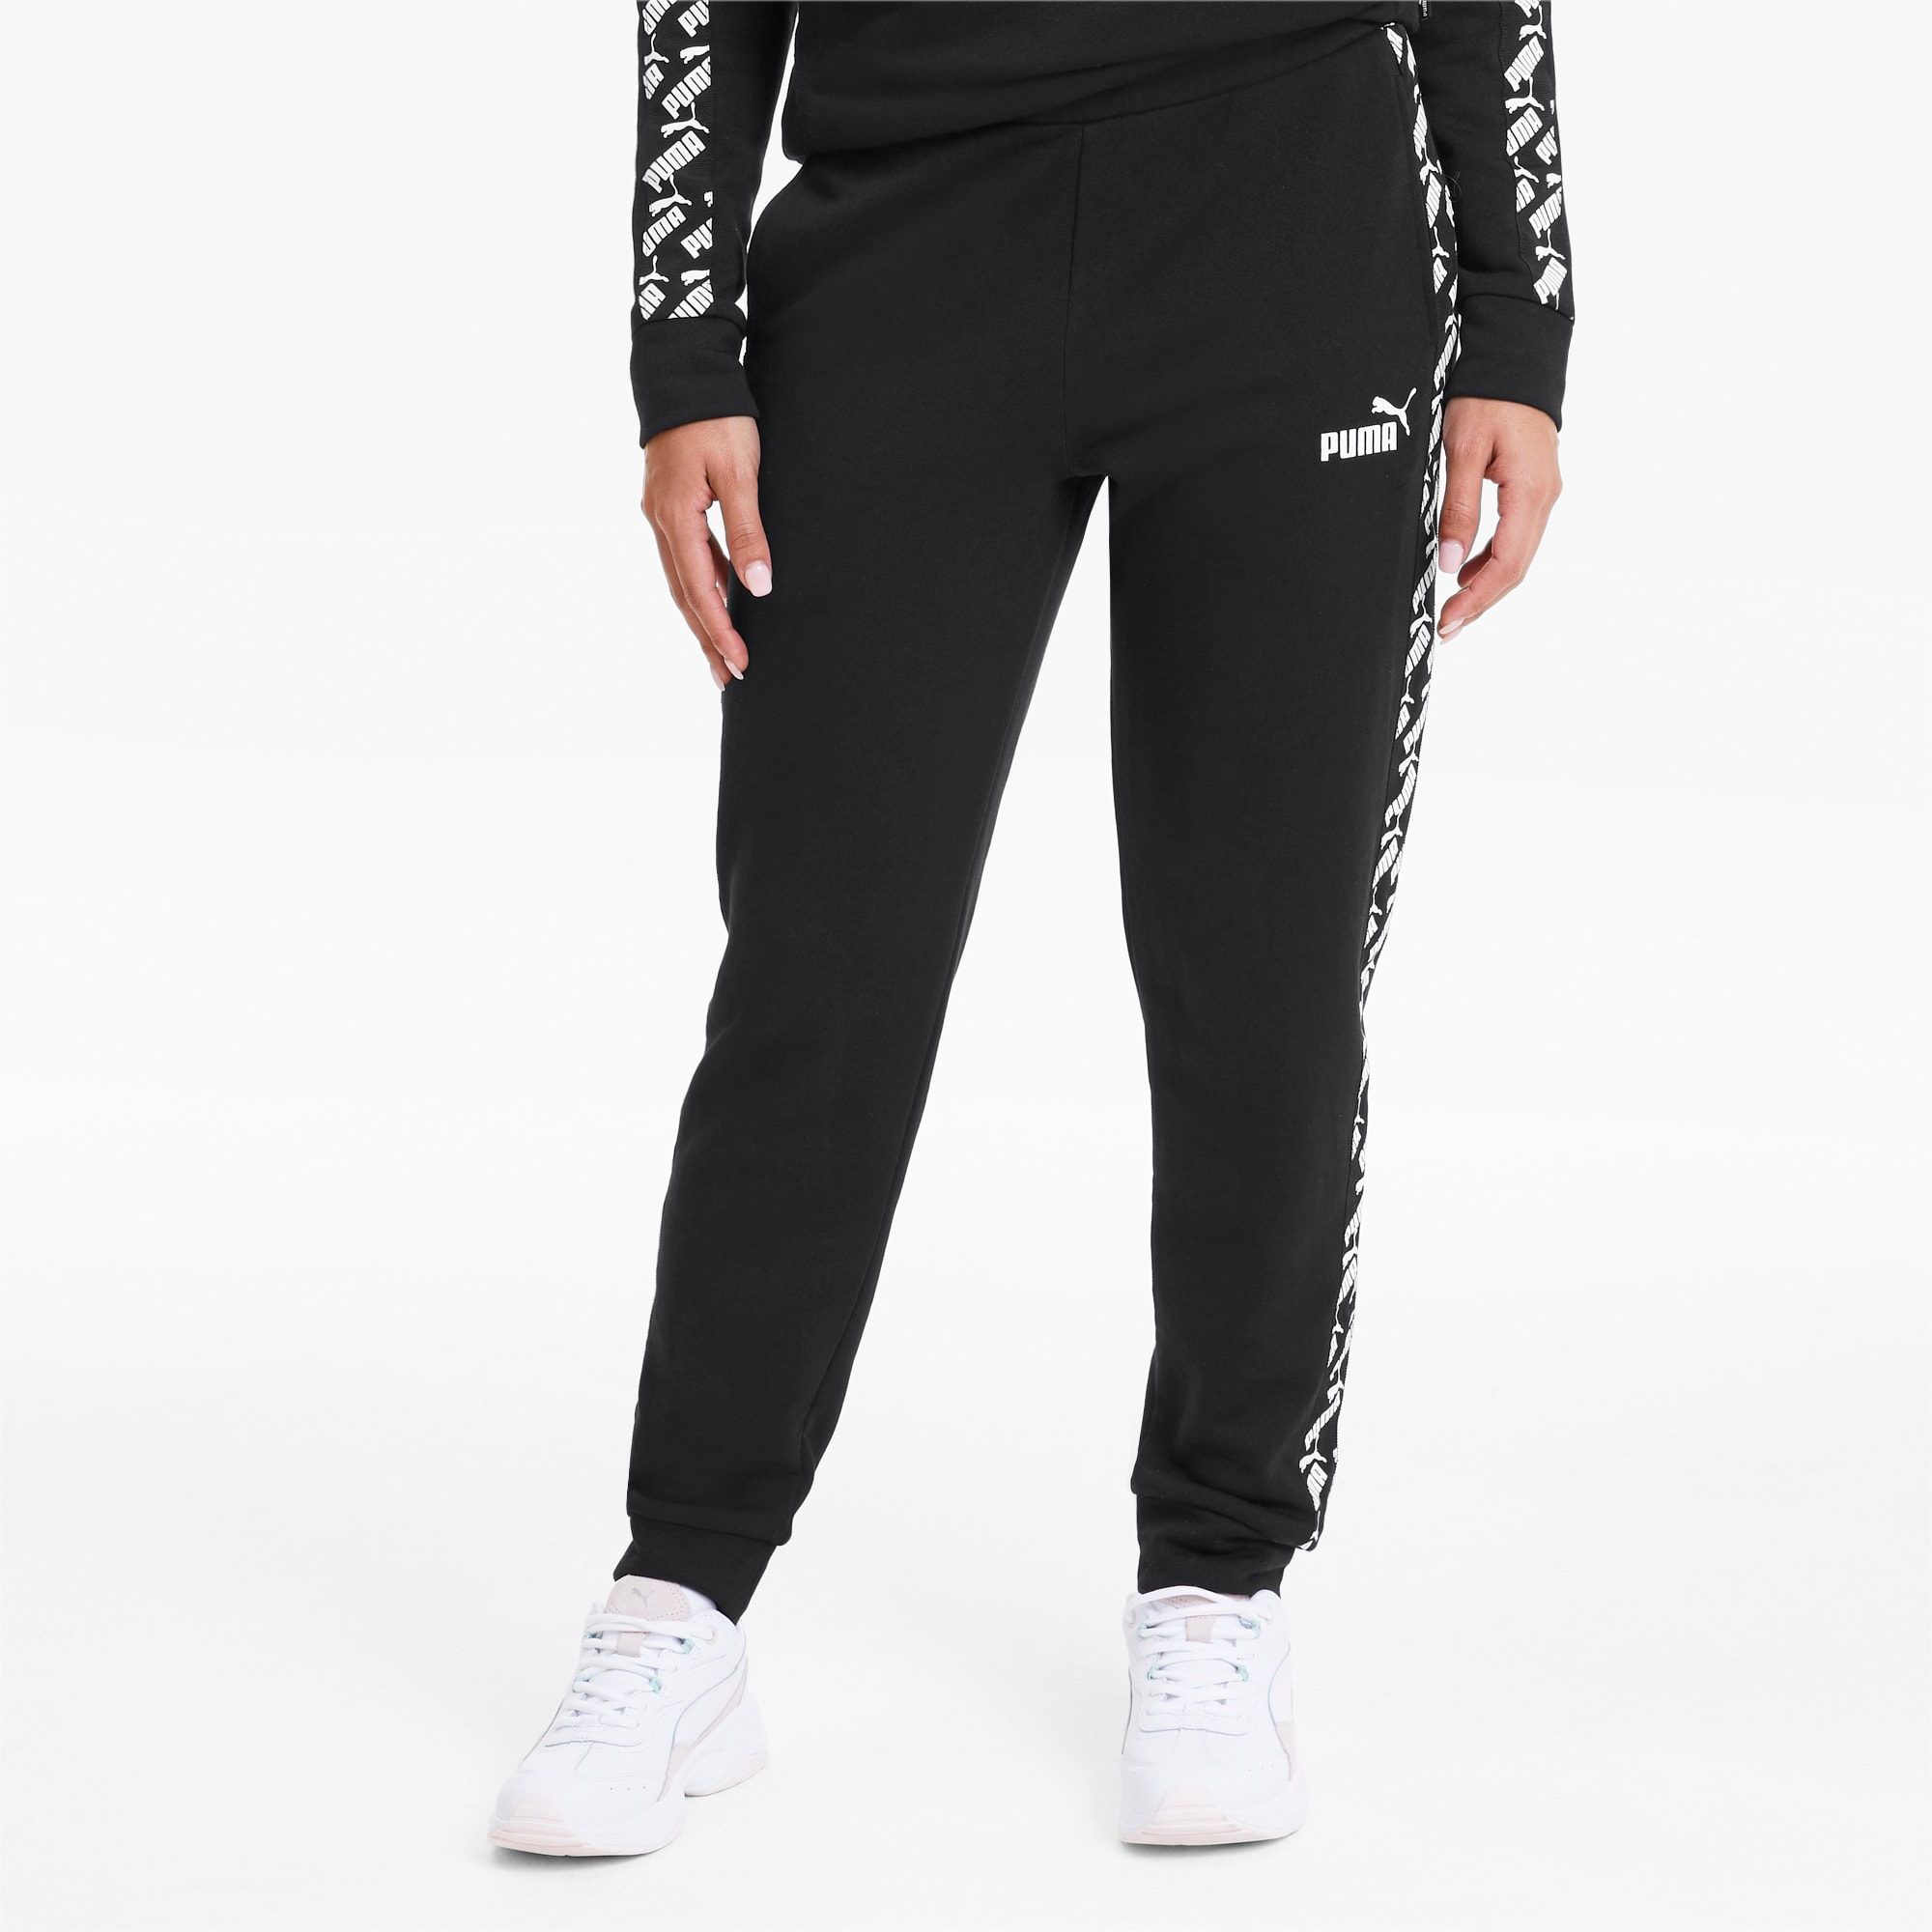 Amplified Women's Track Pants